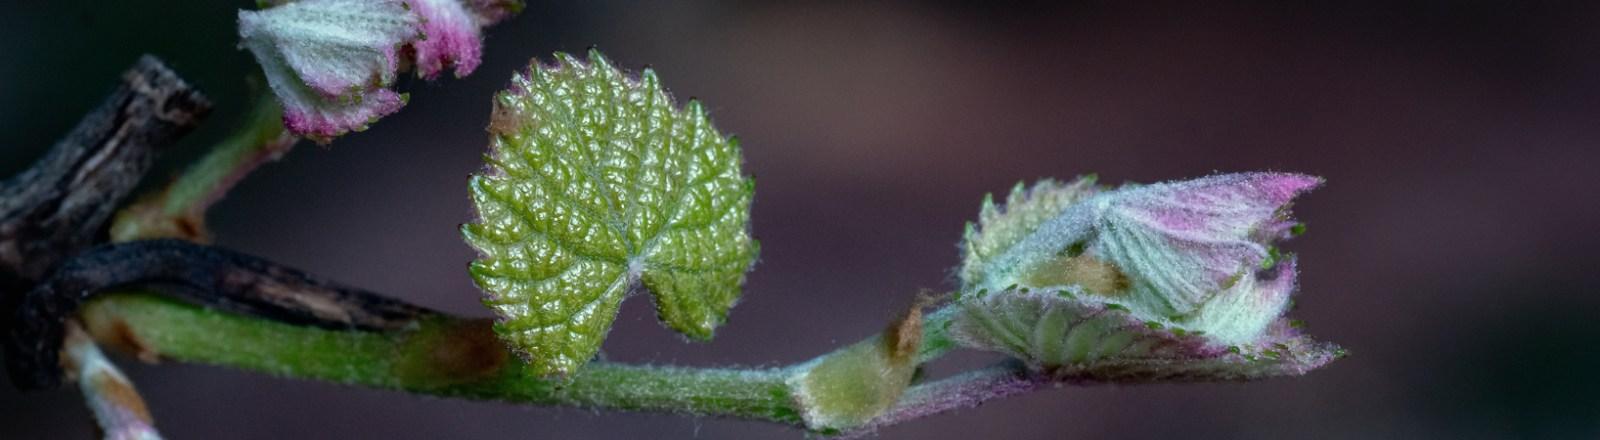 Spring 2020: April Colors 2 (Catawba Grapevine)